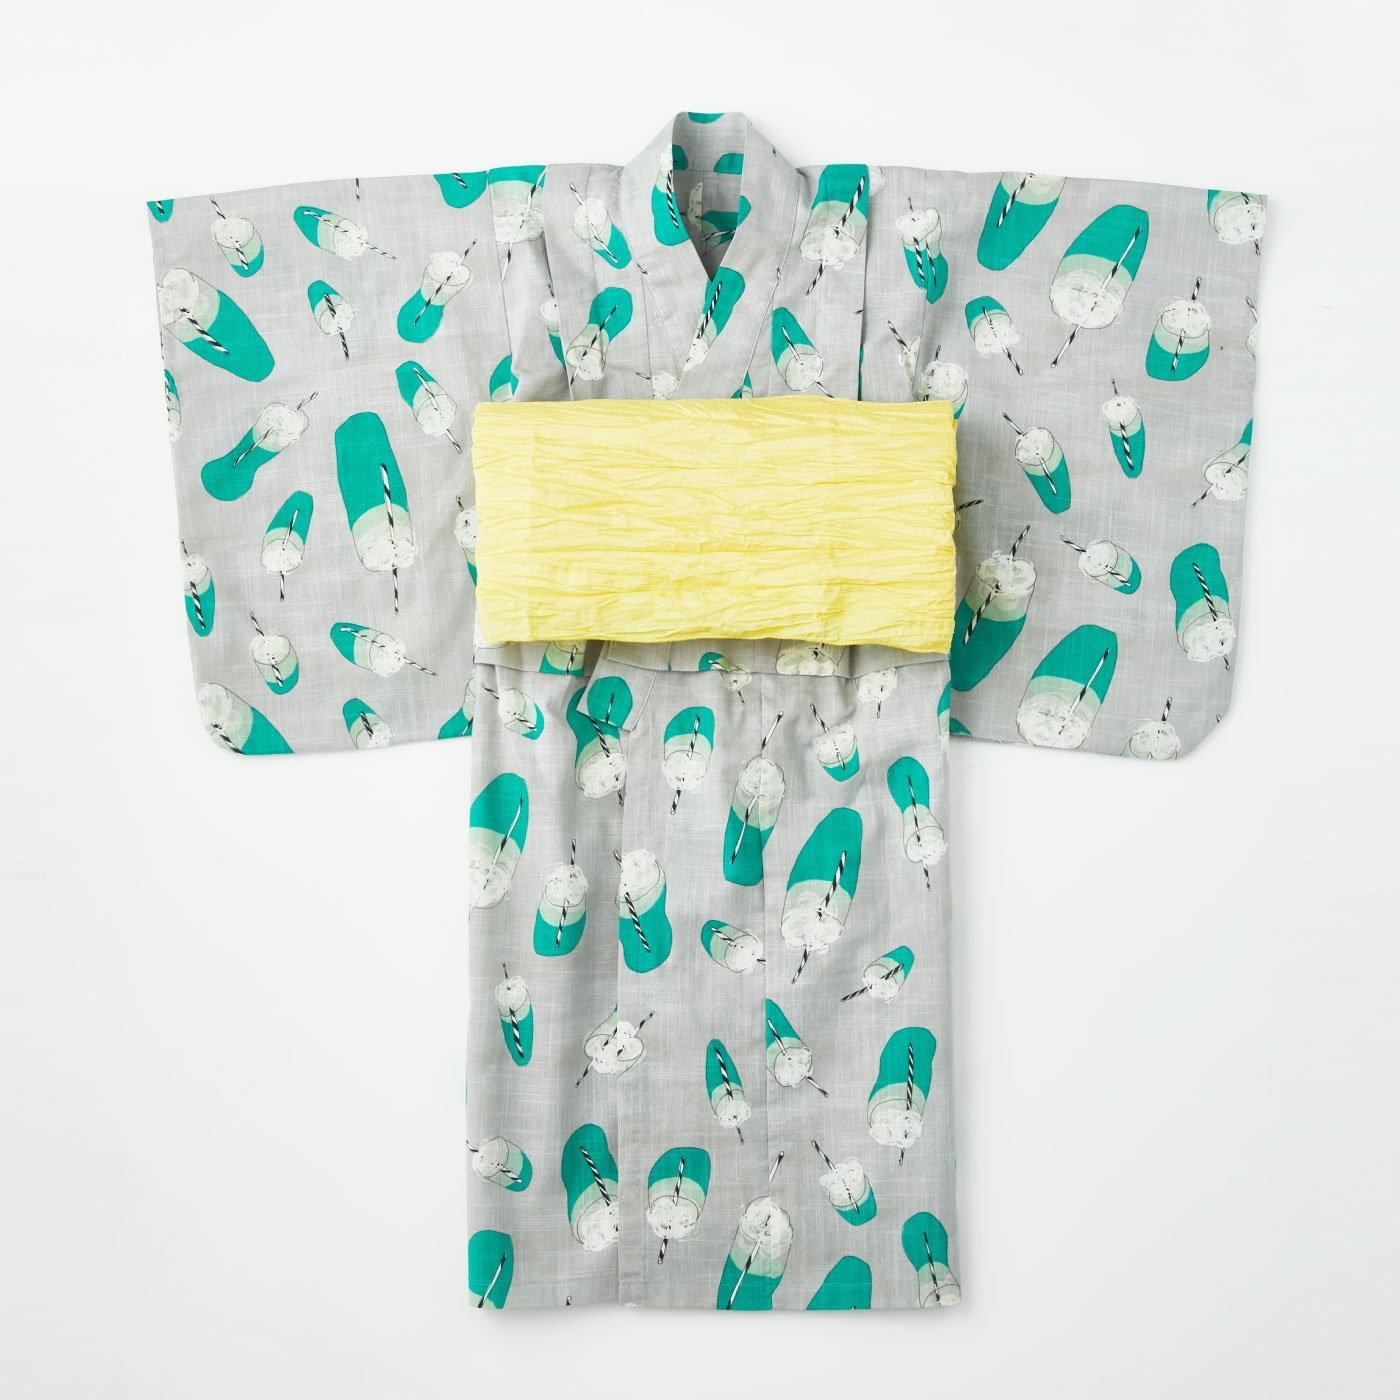 Subikiawa食器店さんとつくった クリームソーダ柄の浴衣(ゆかた)